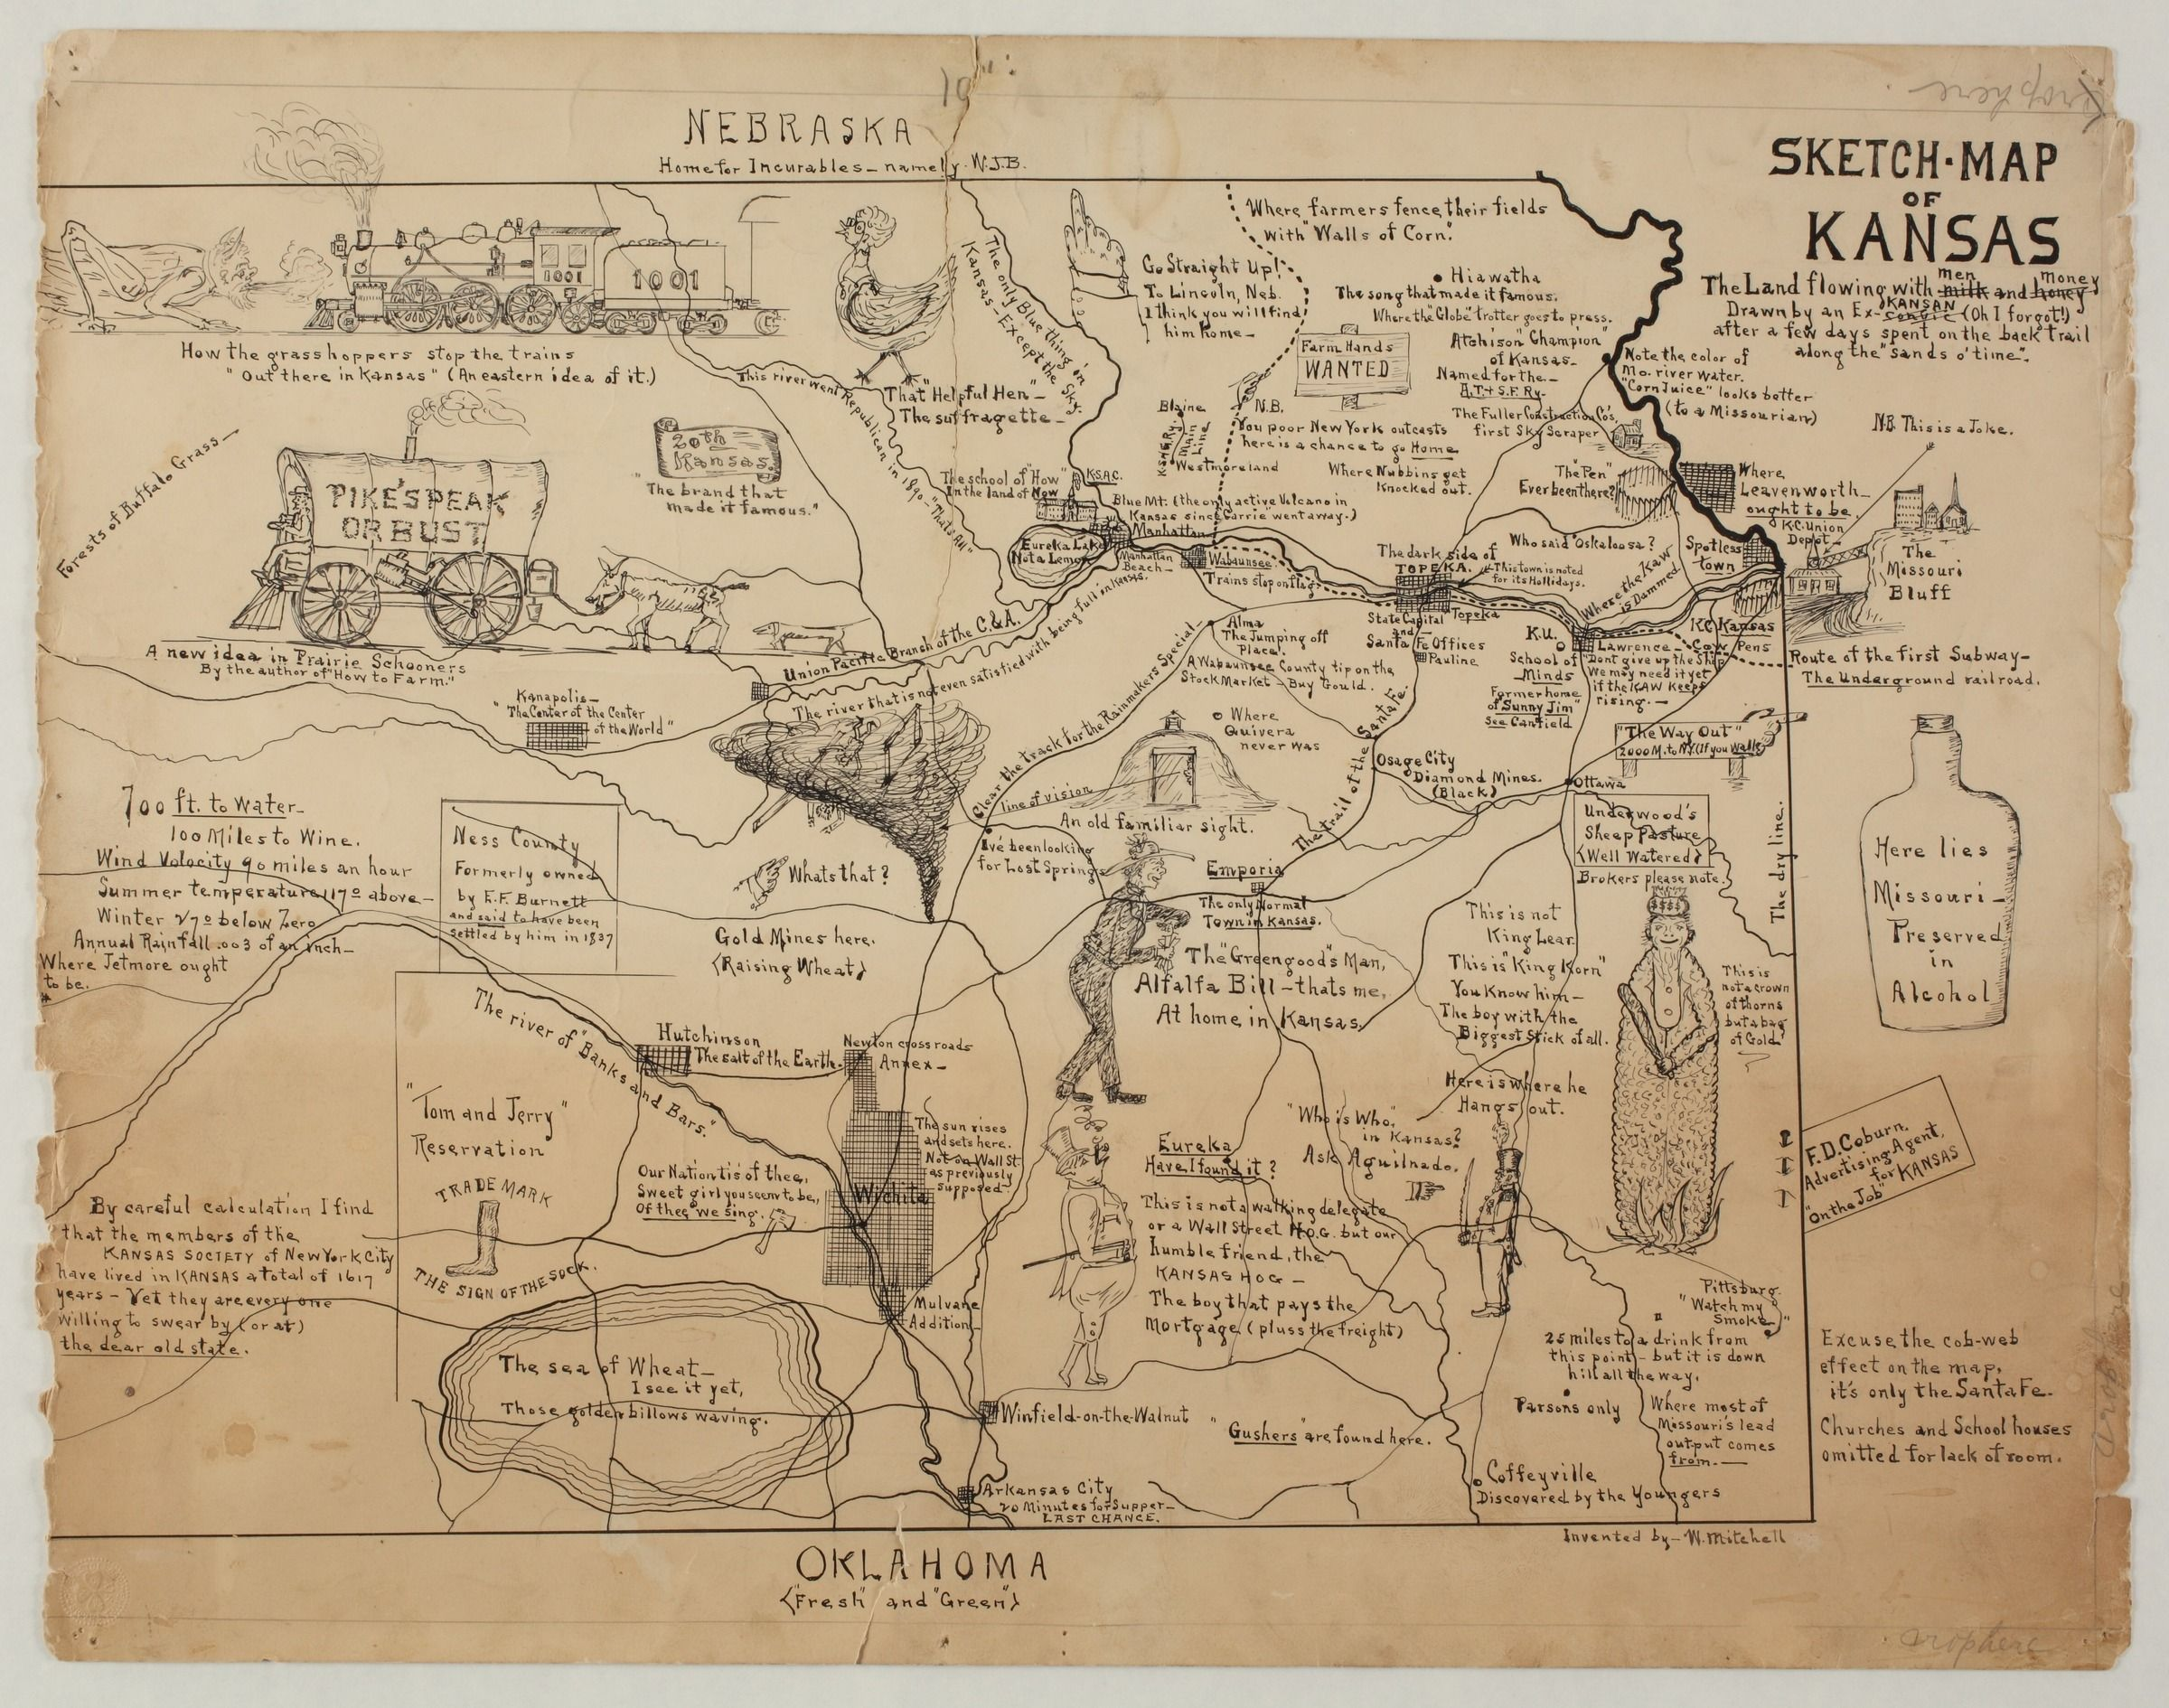 Underground Railroad New York Map.Ks A Cartoon Map Of The Underground Railroad By William Izott